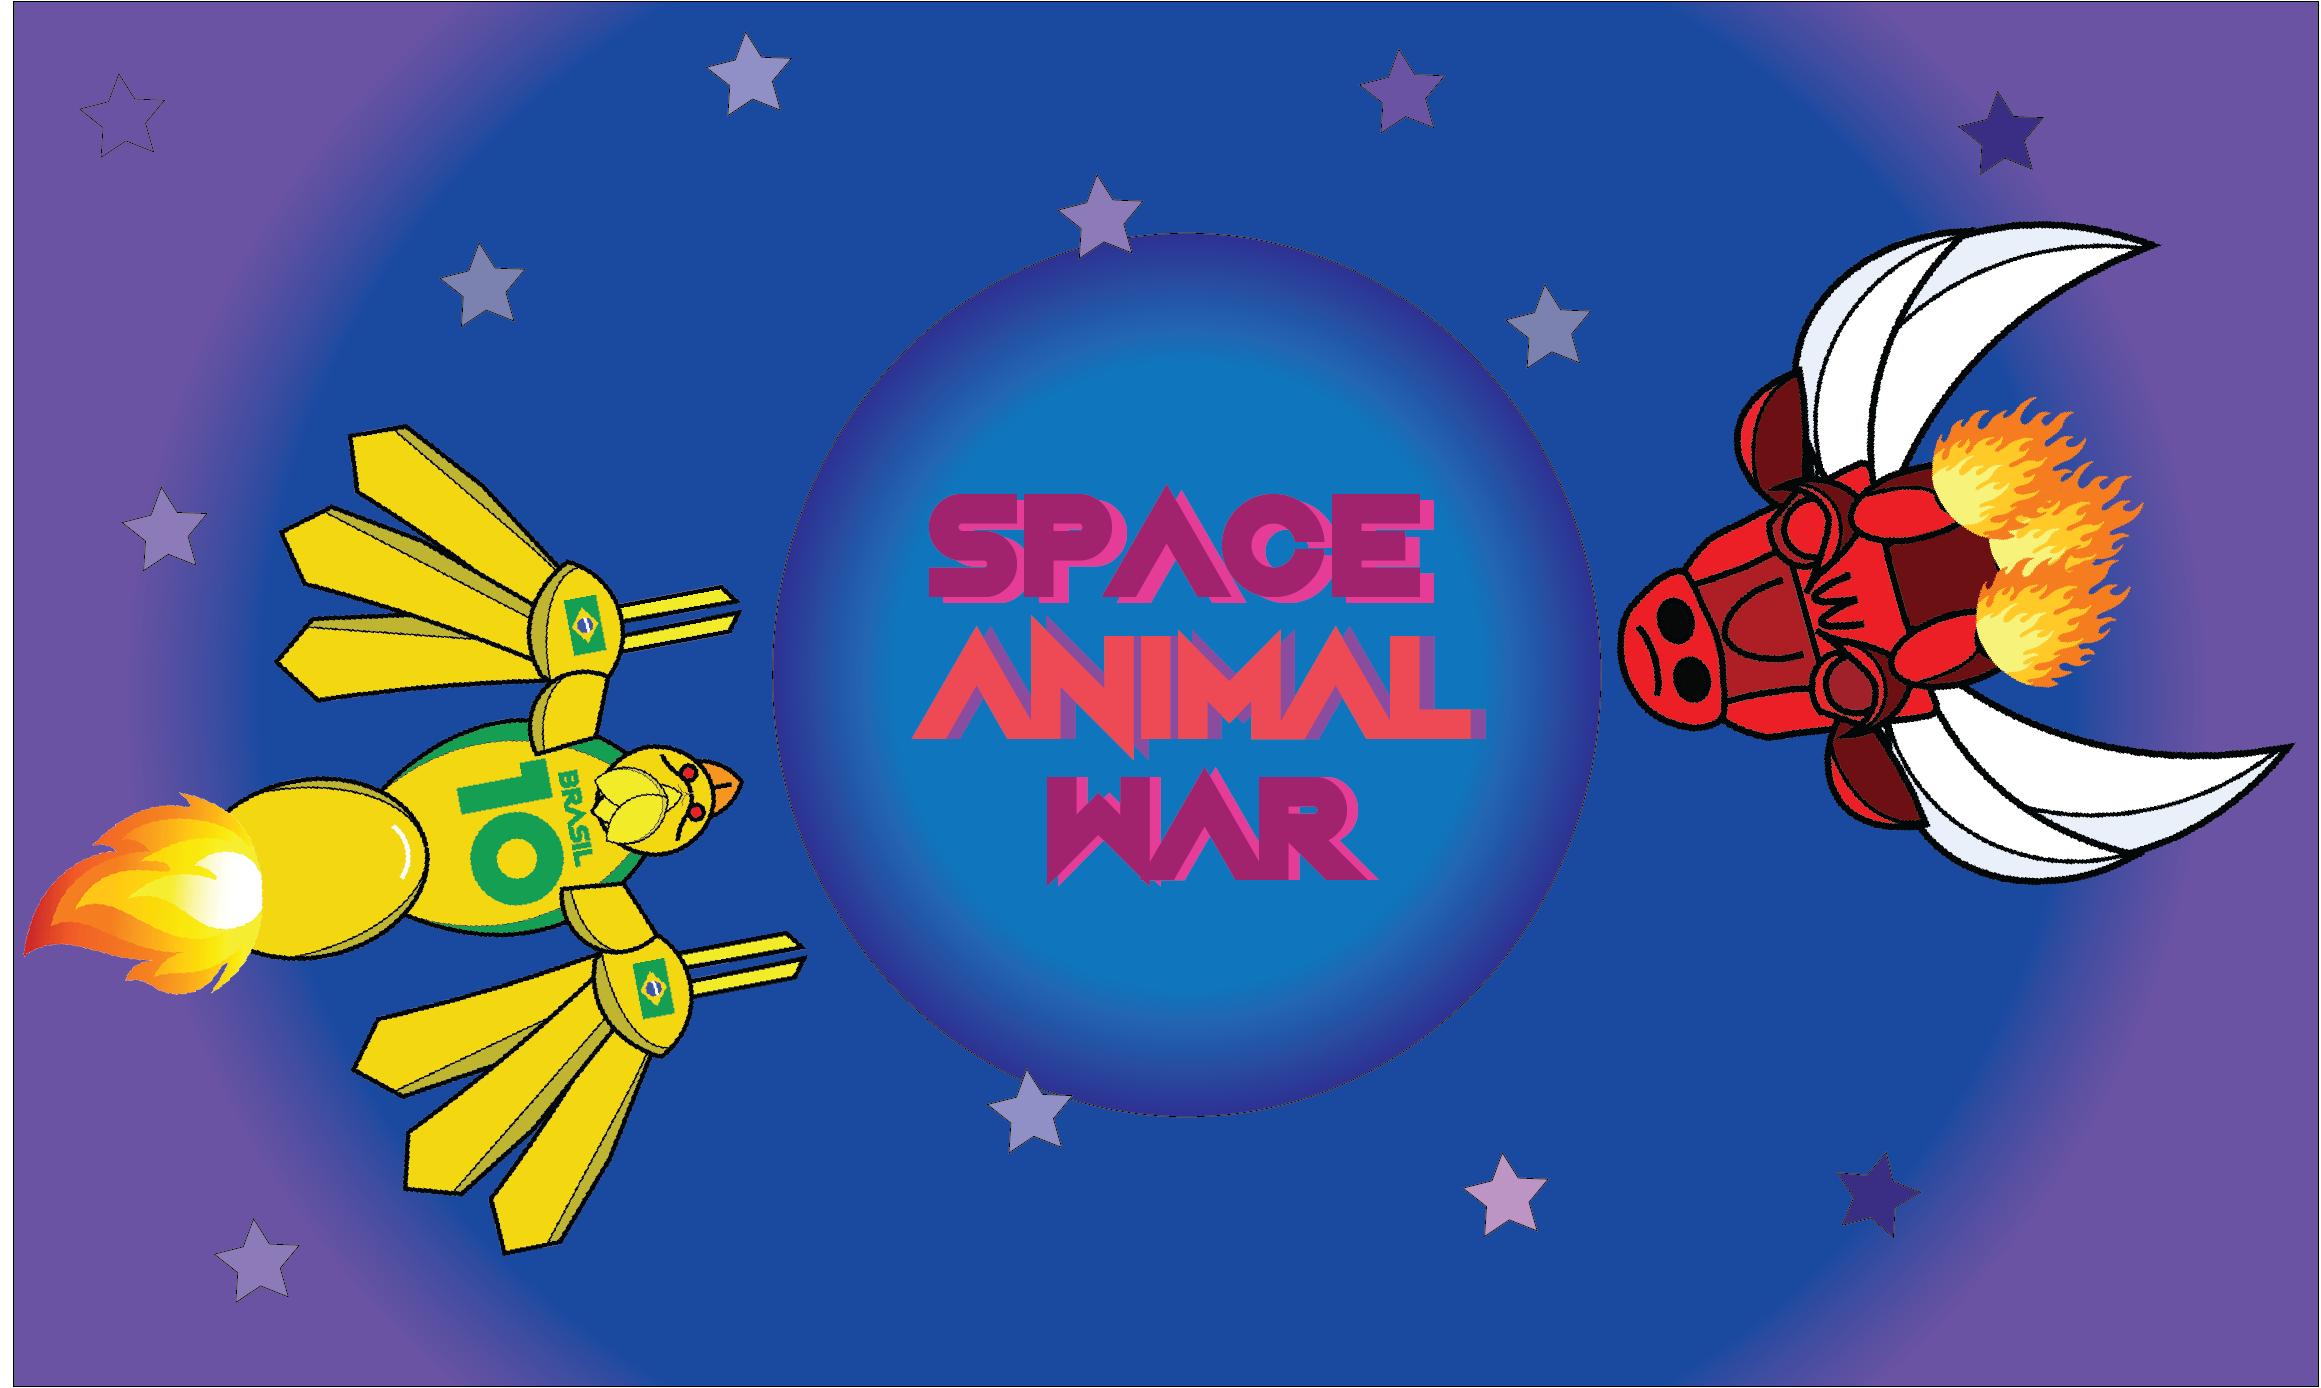 Space Animal War - OPEN BETA NOW!